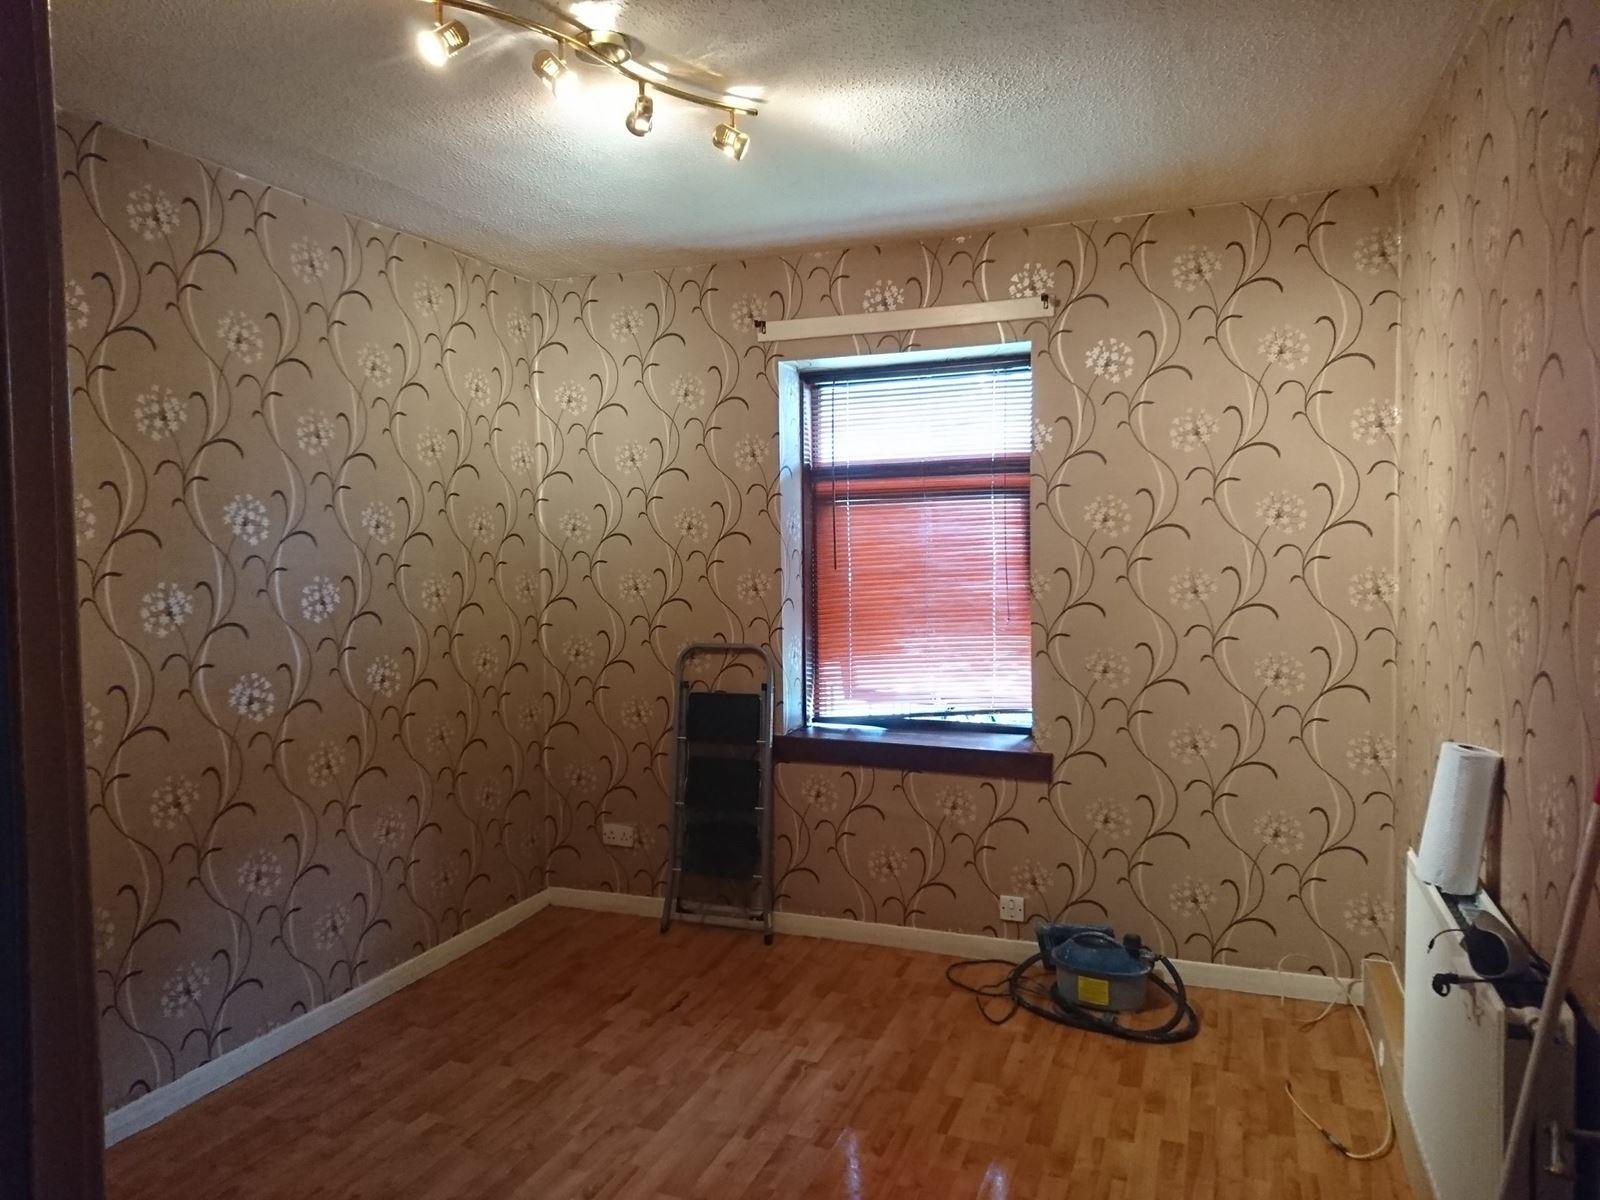 wall-insulation-Edinburgh-insulation-companies-Edinburgh